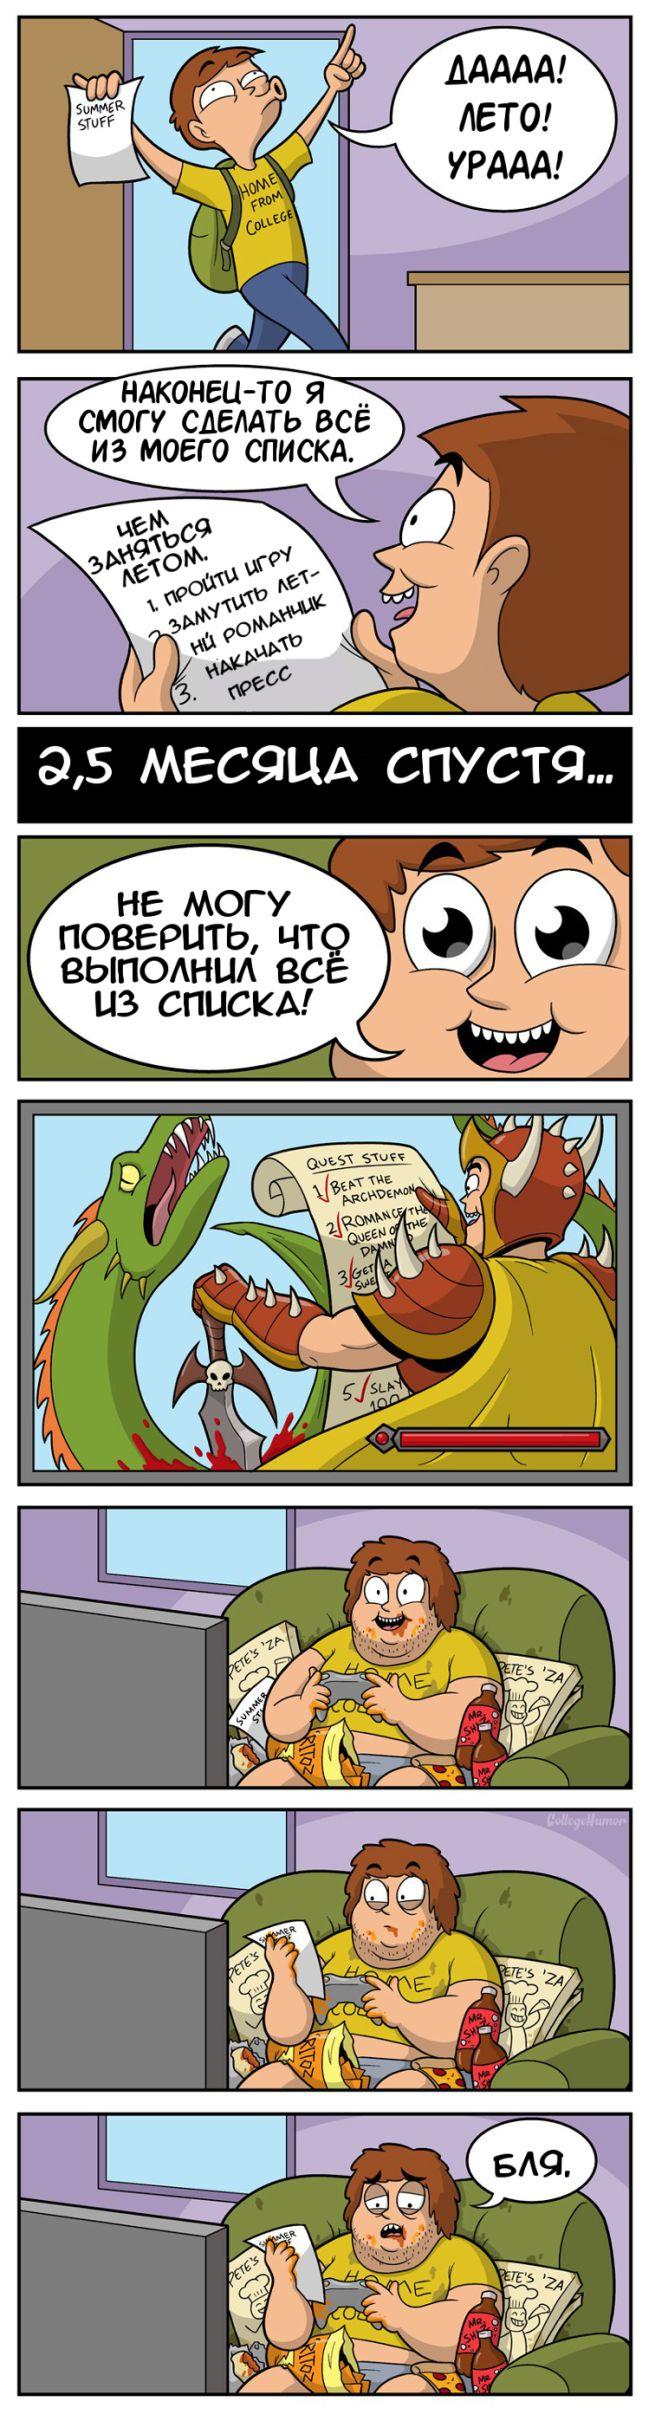 Комиксы на пятницу